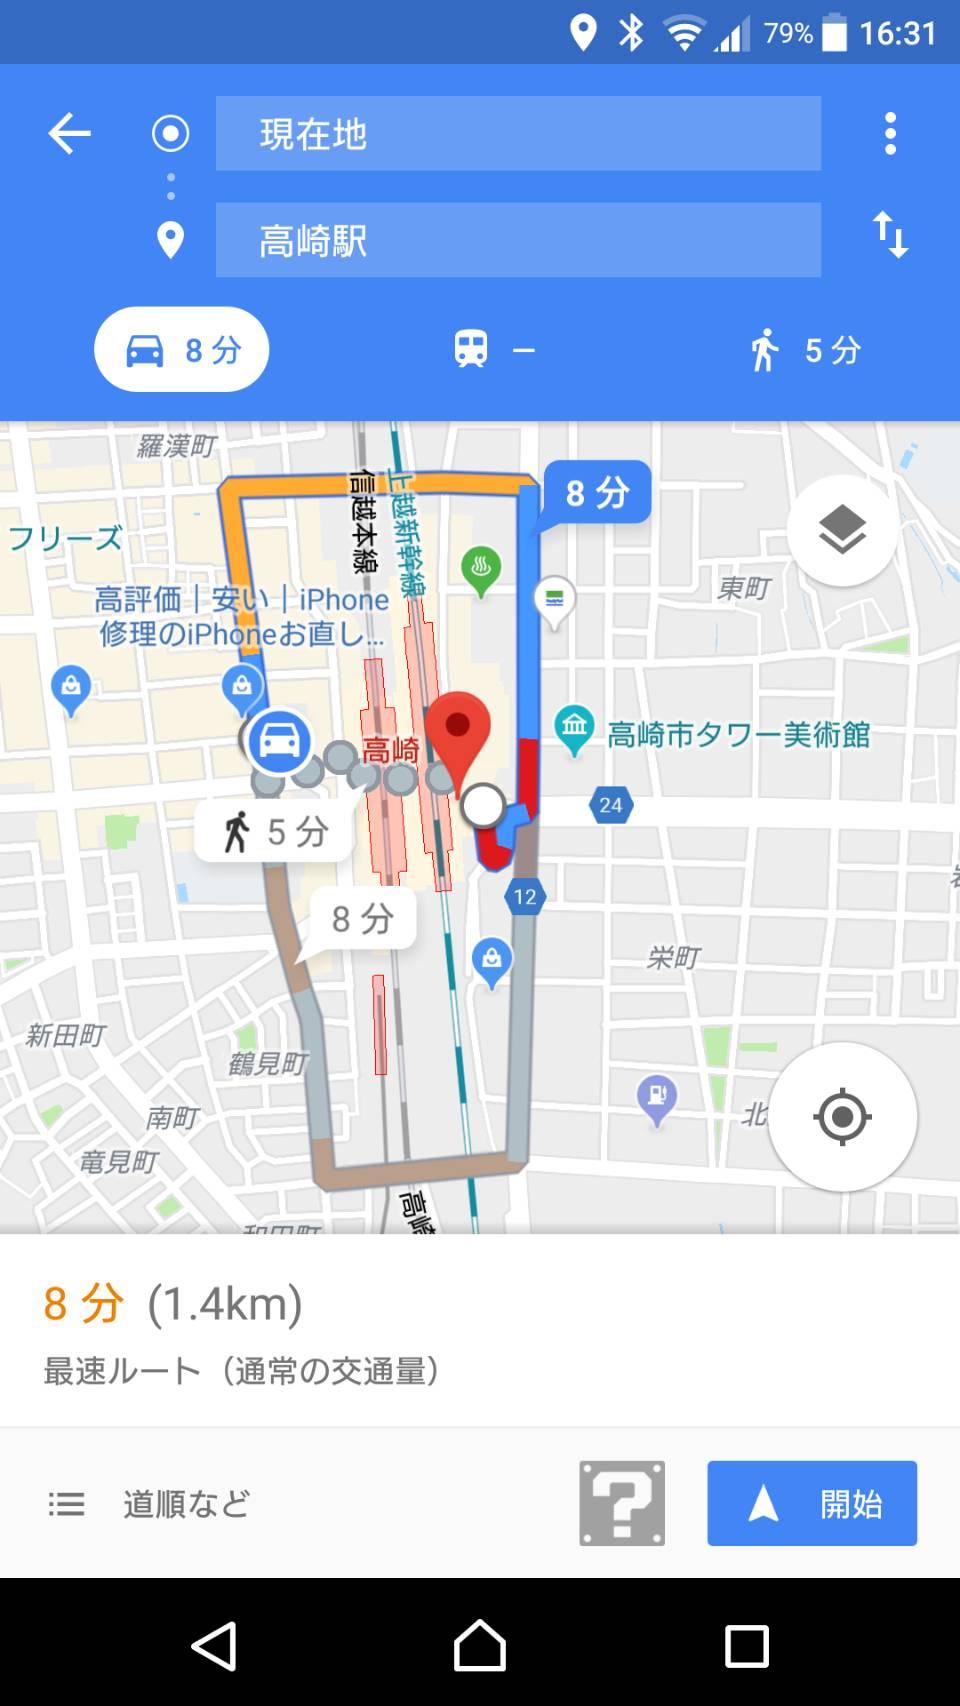 googlemap | mariomode